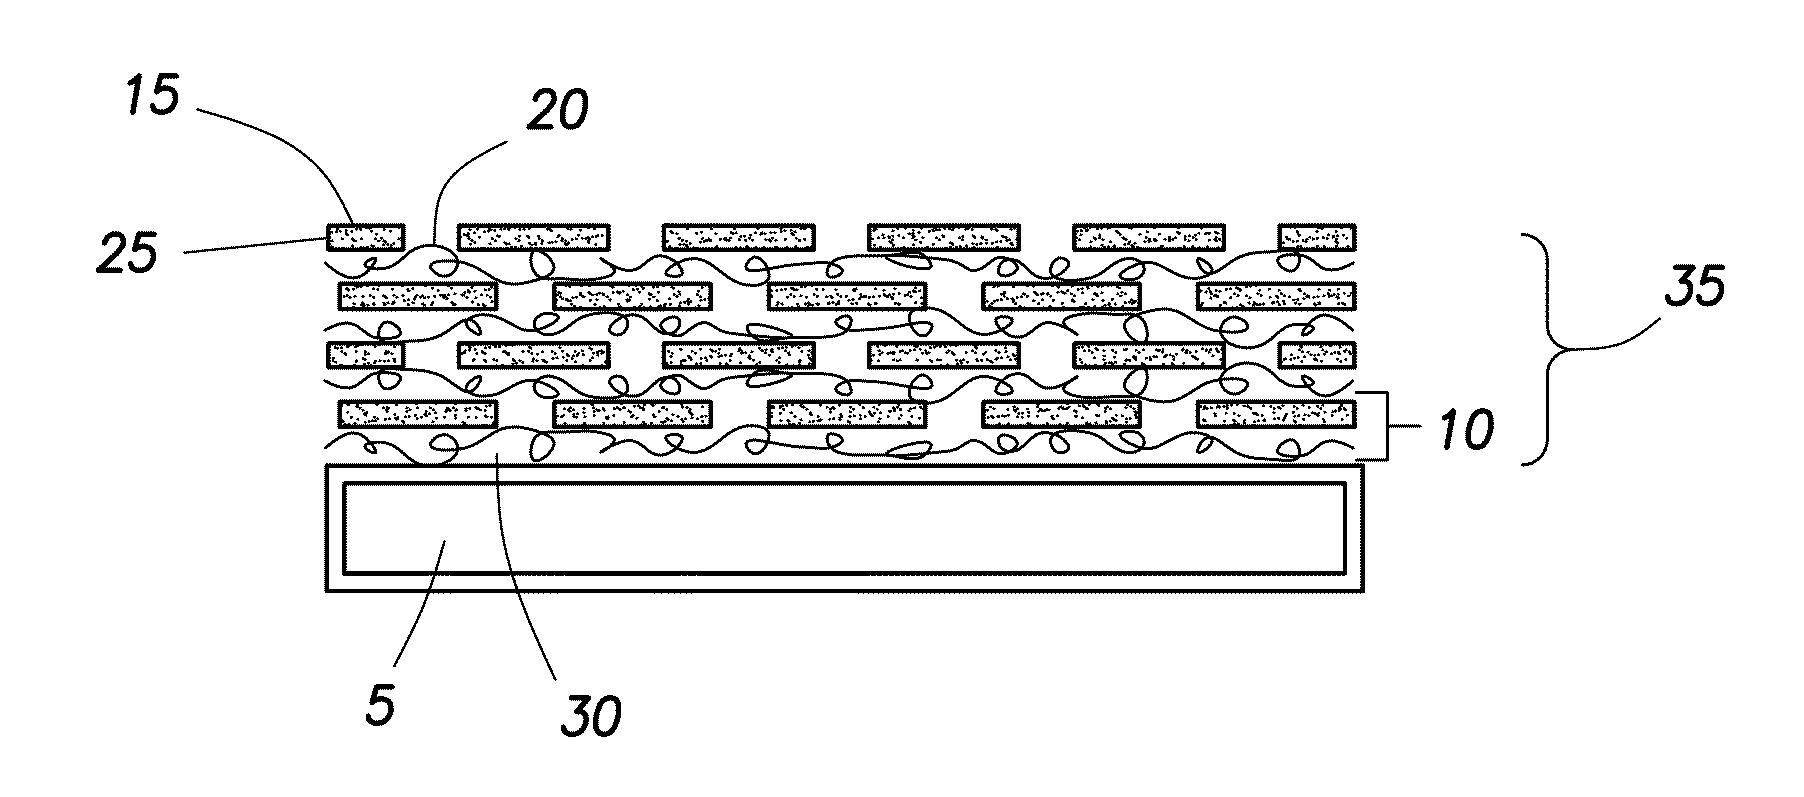 Patent Us20100227070 Multilayer Coating For Flame Retardant Foam 1993 Honda Civic Del Sol Electrical Harness Wiring Diagram Drawing